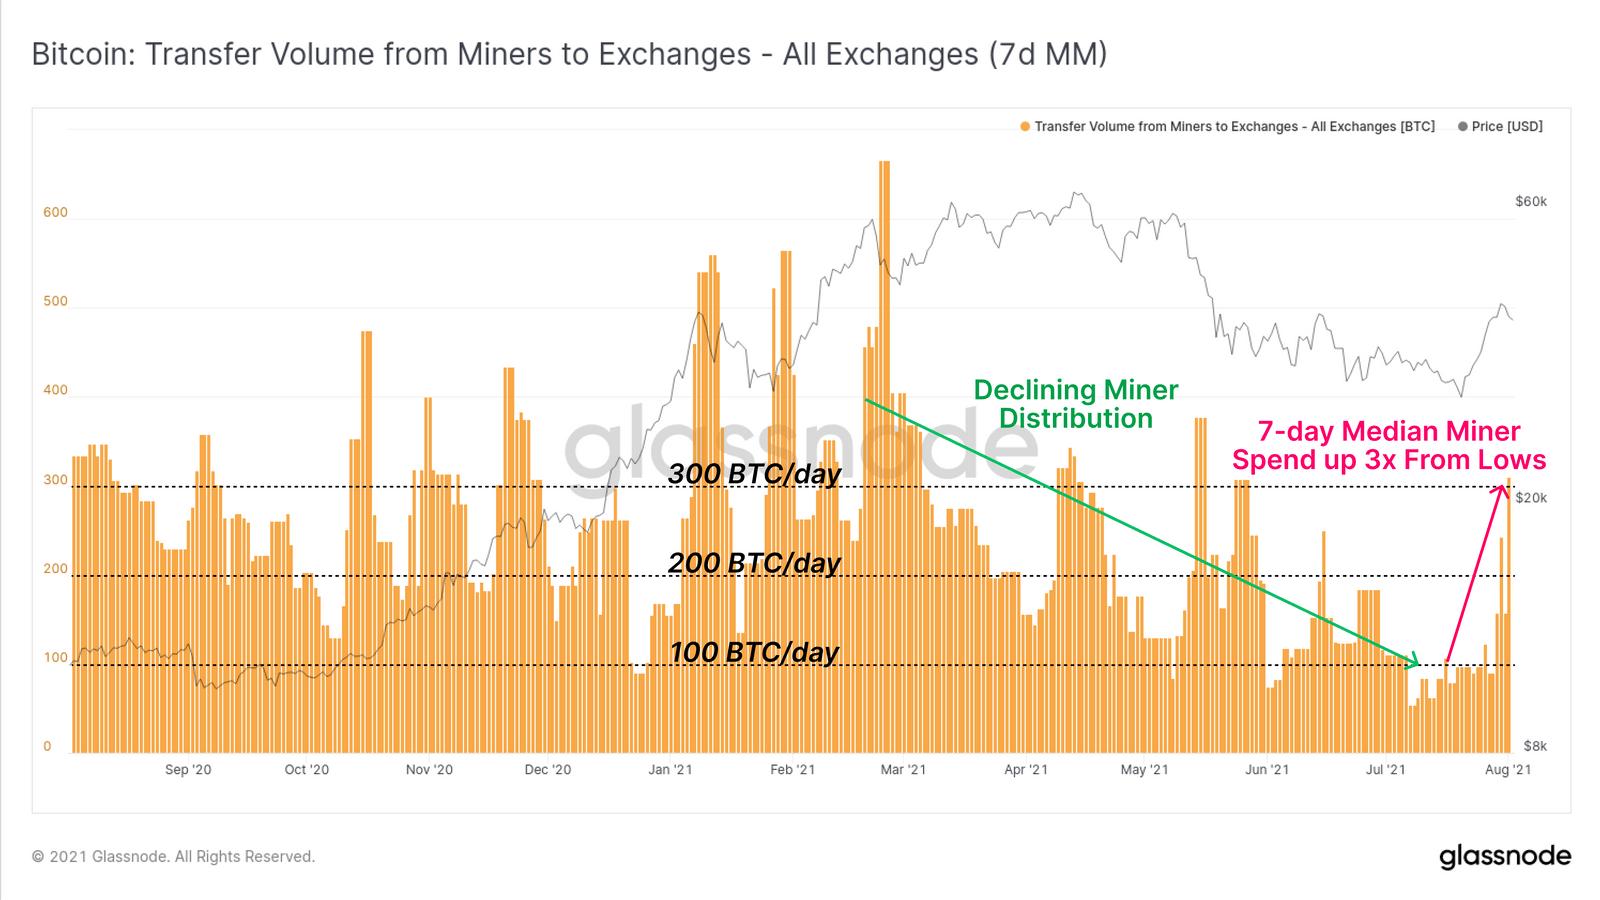 BTC-Miner Distribution zu Krypto Börsen